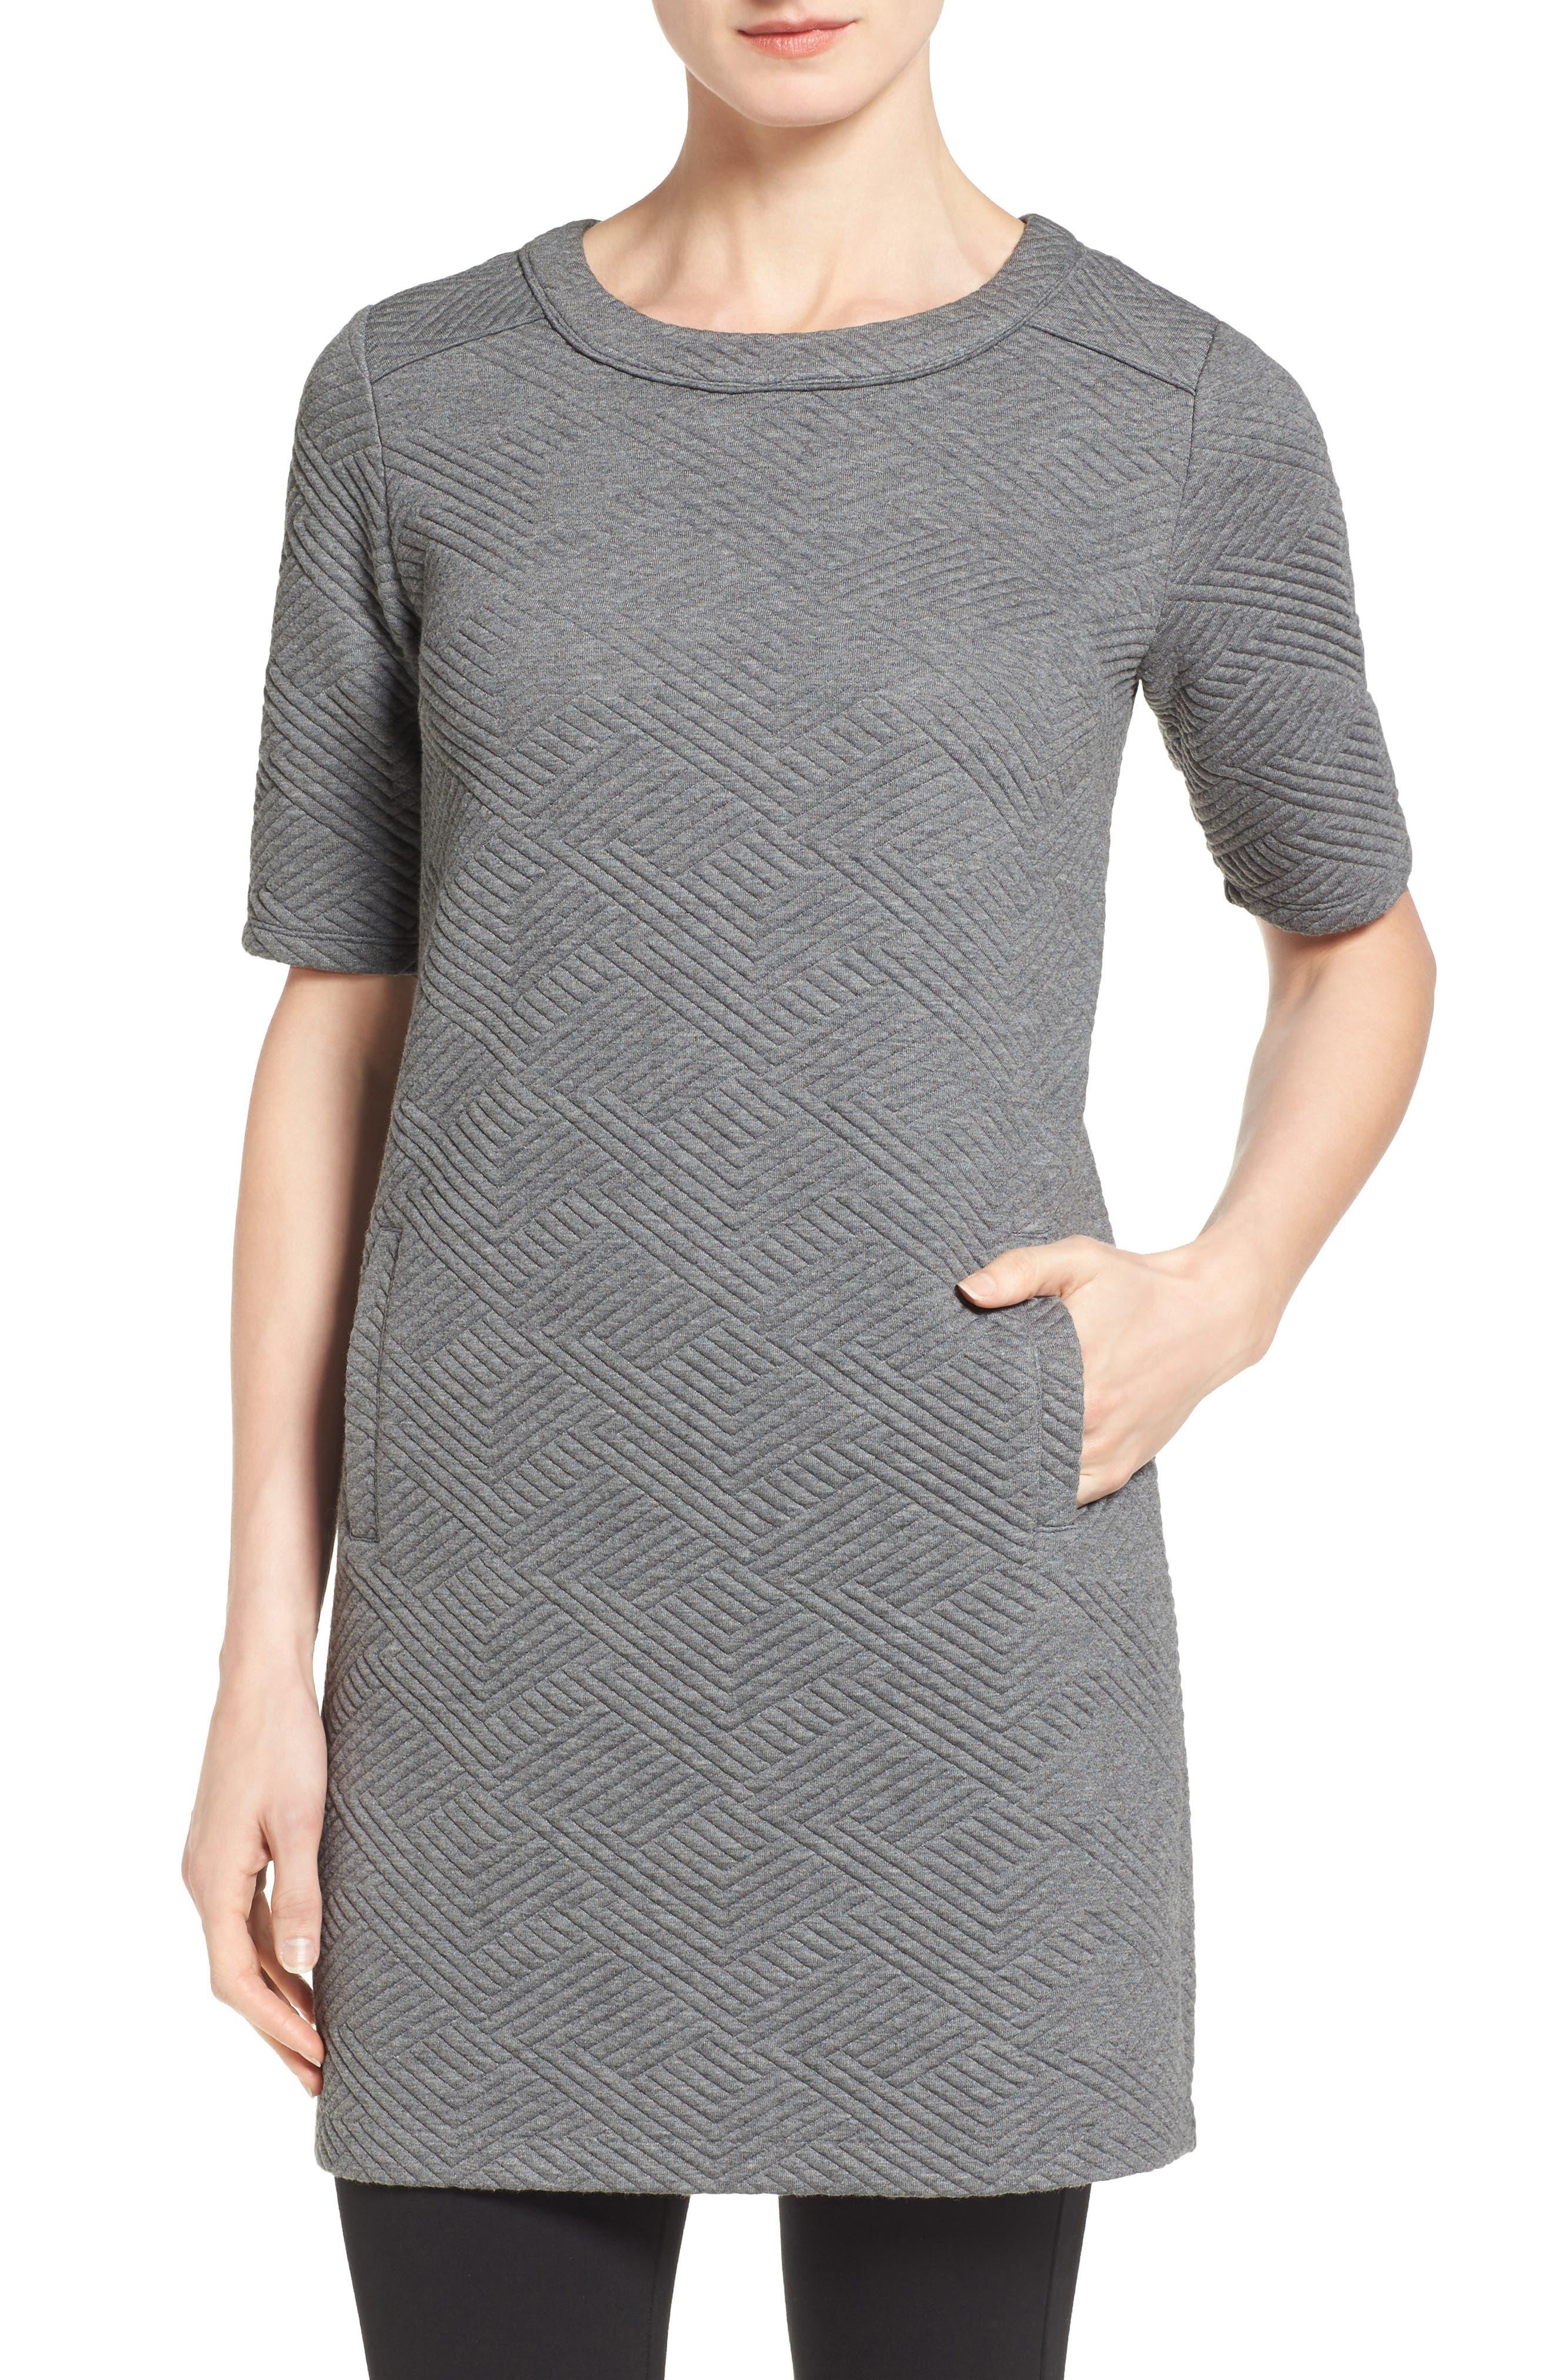 Textured Elbow Sleeve Tunic Dress,                             Alternate thumbnail 6, color,                             030